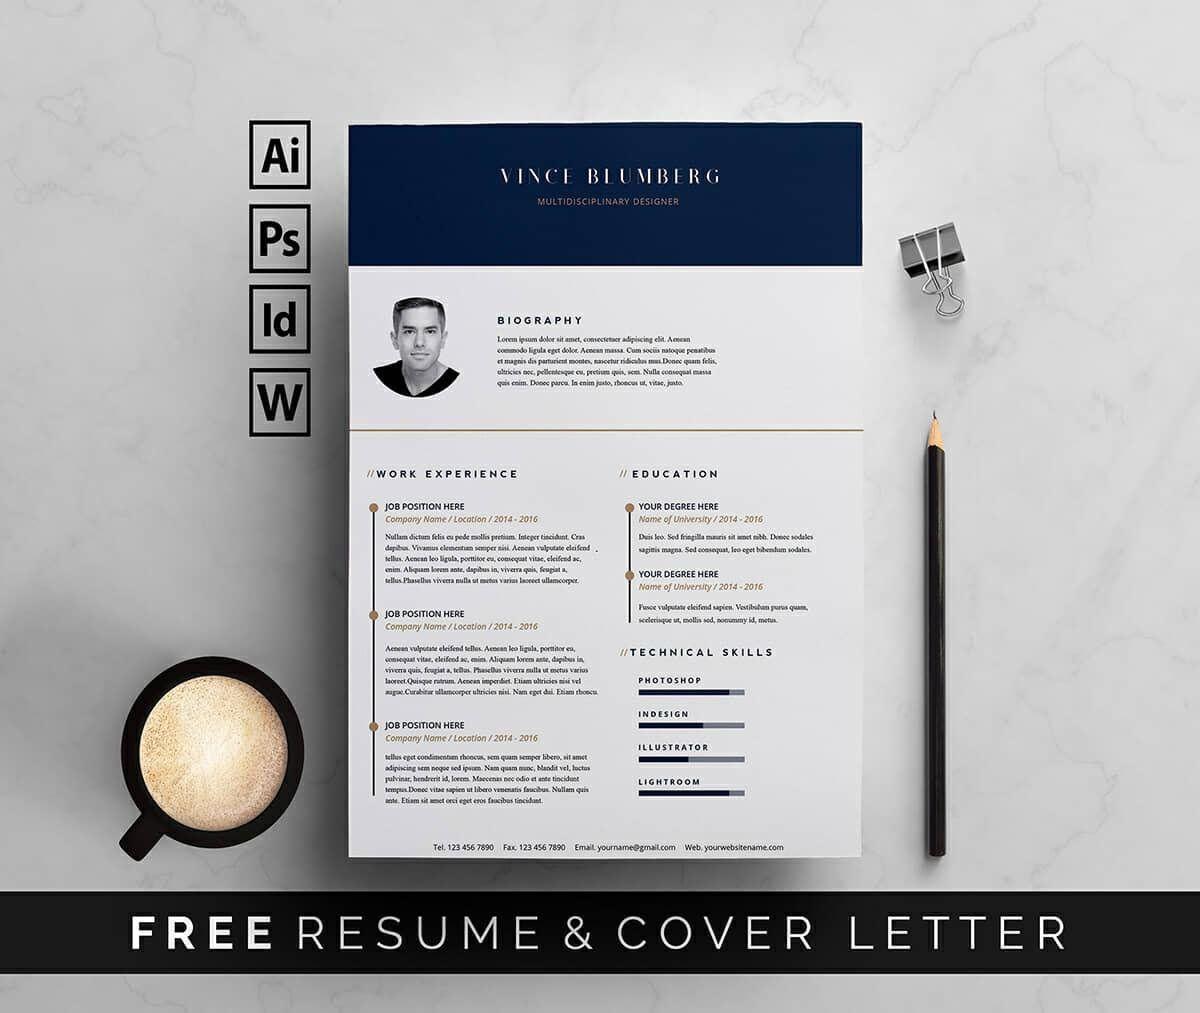 010 Fantastic Resume Template Word Free Download 2018 Example  Modern CvFull